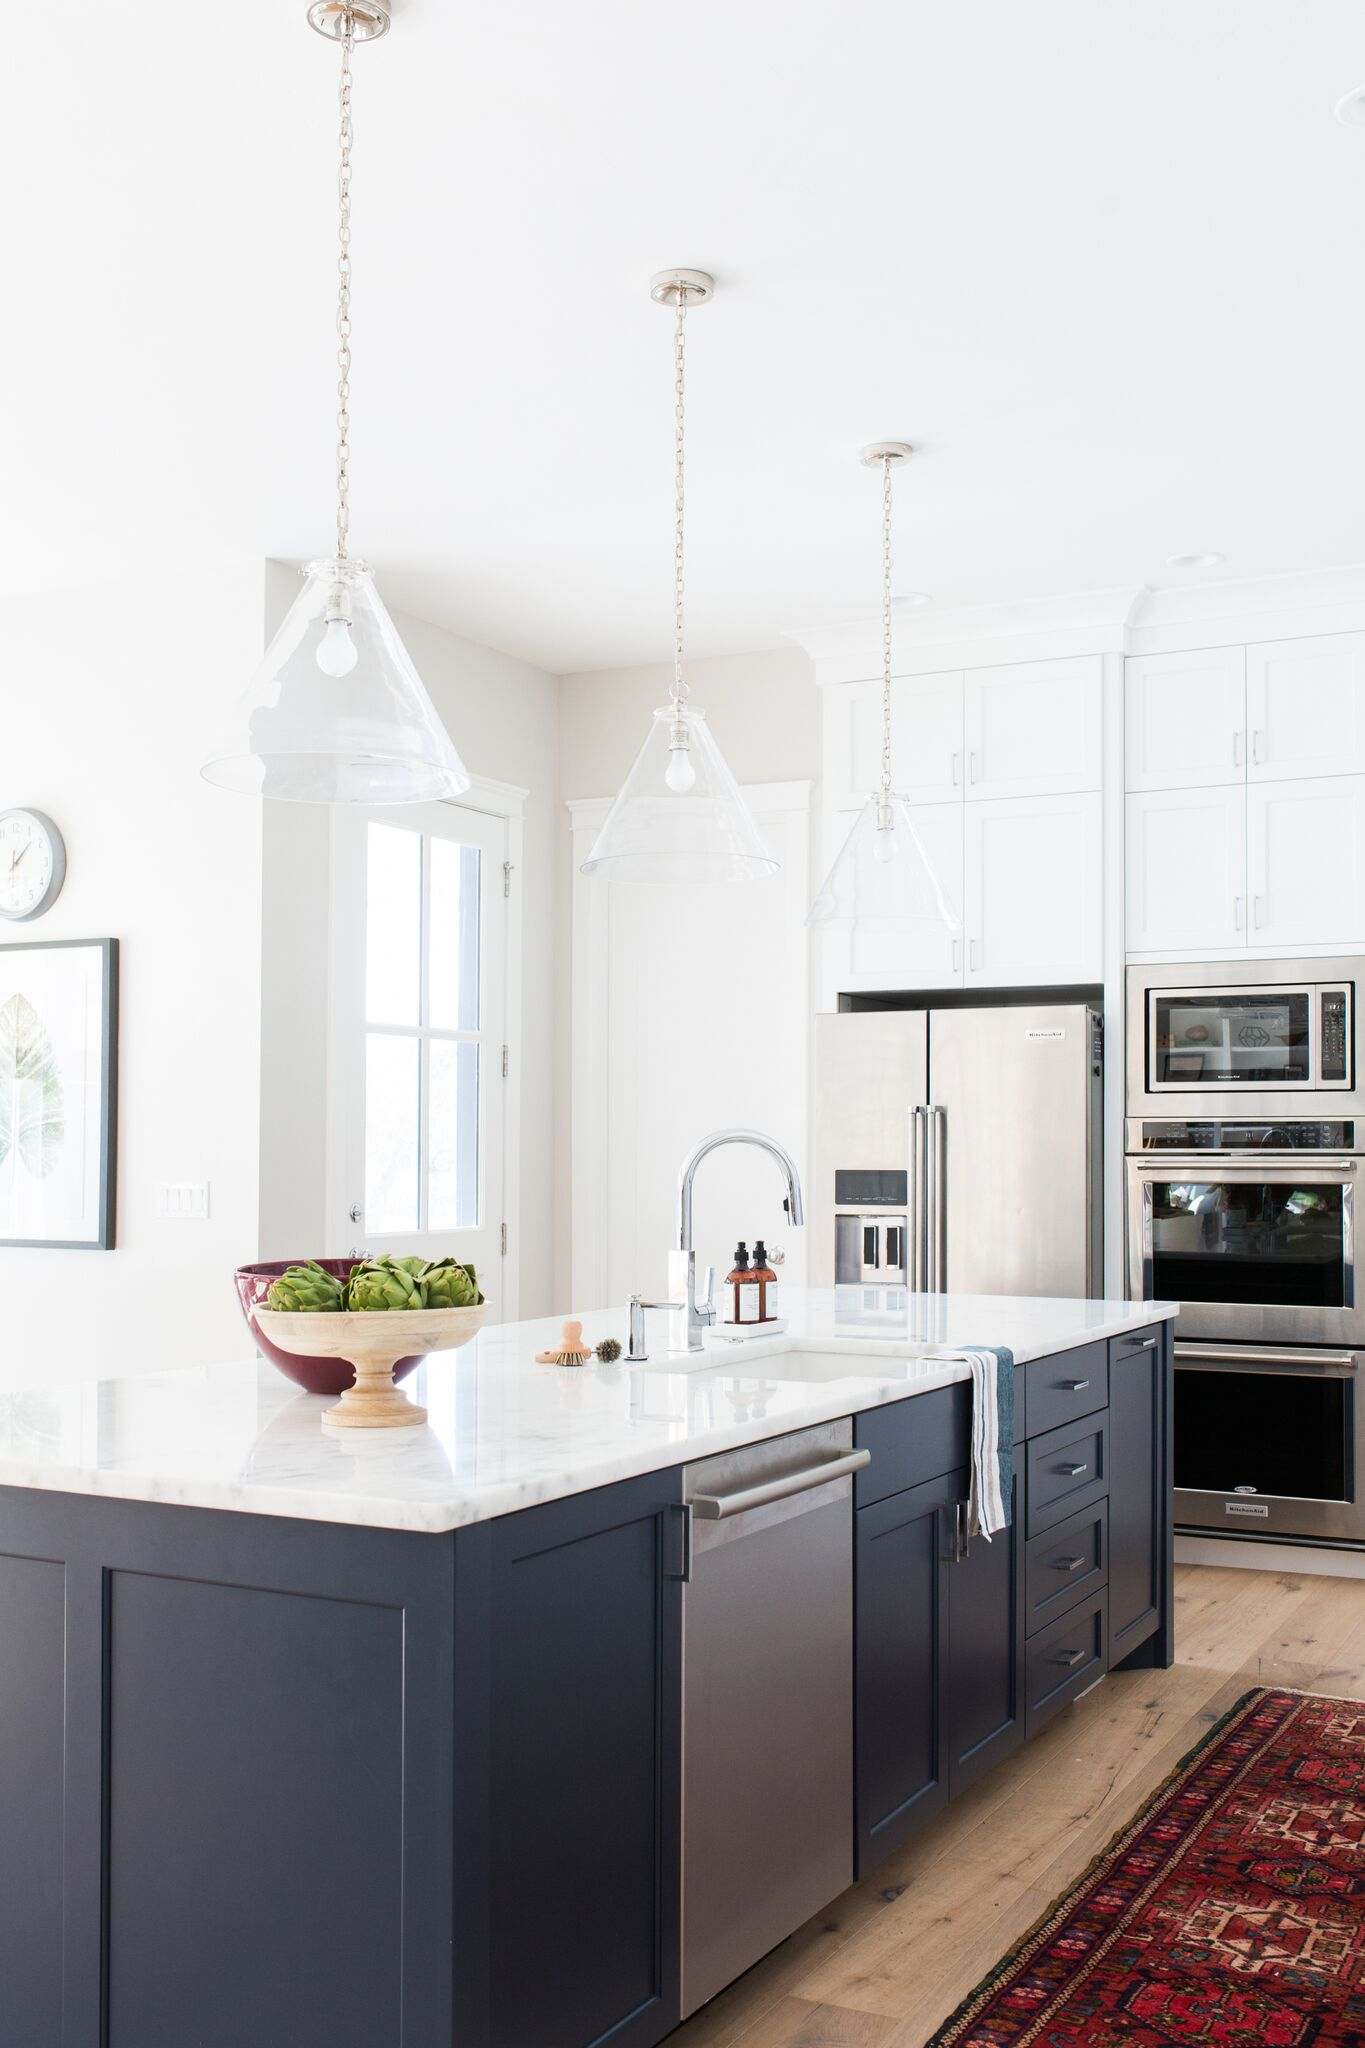 Modern kitchen island in cove street home